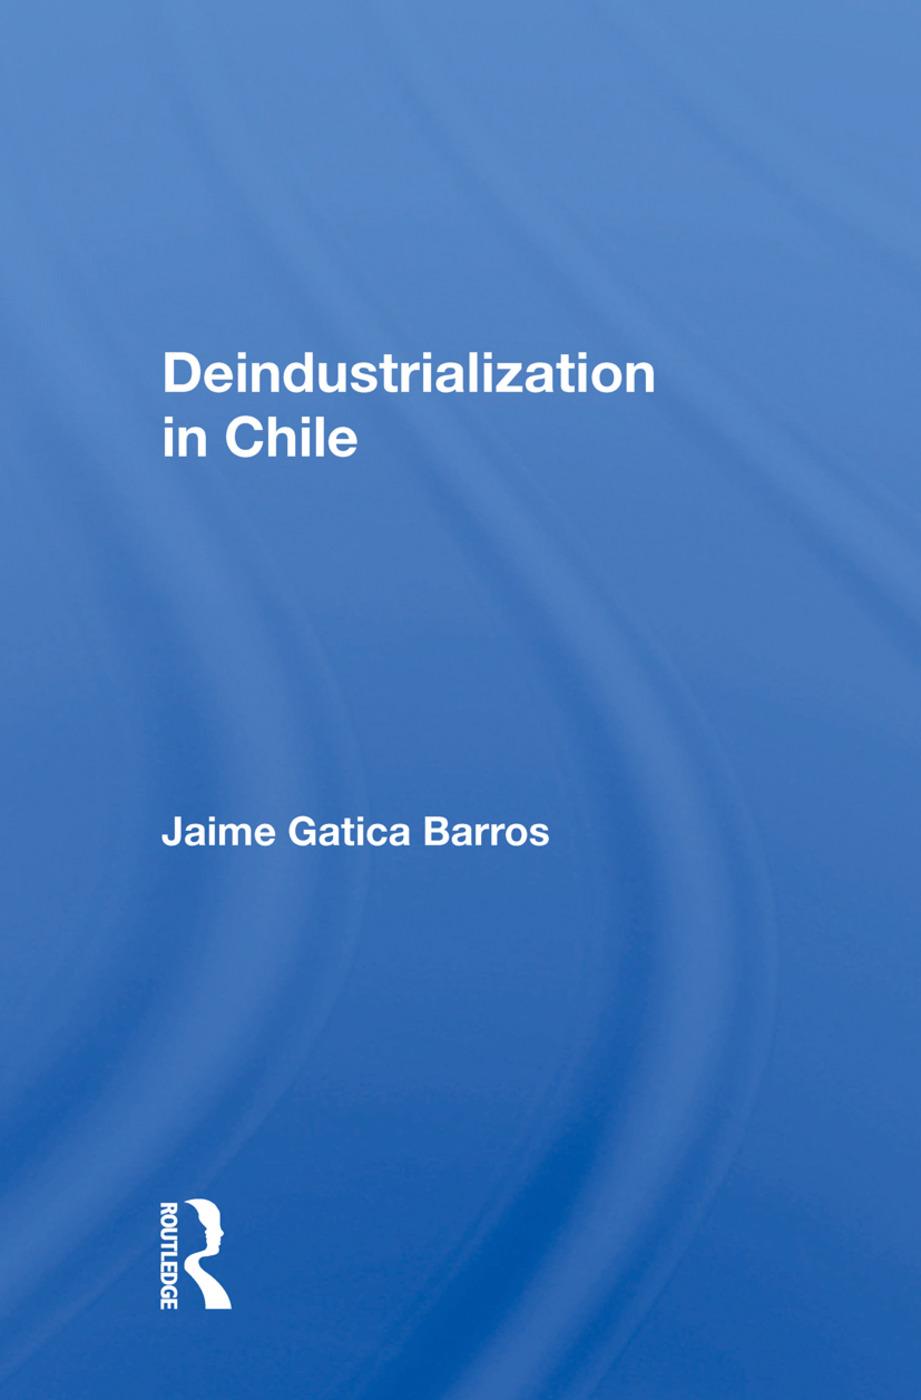 Deindustrialization in Chile